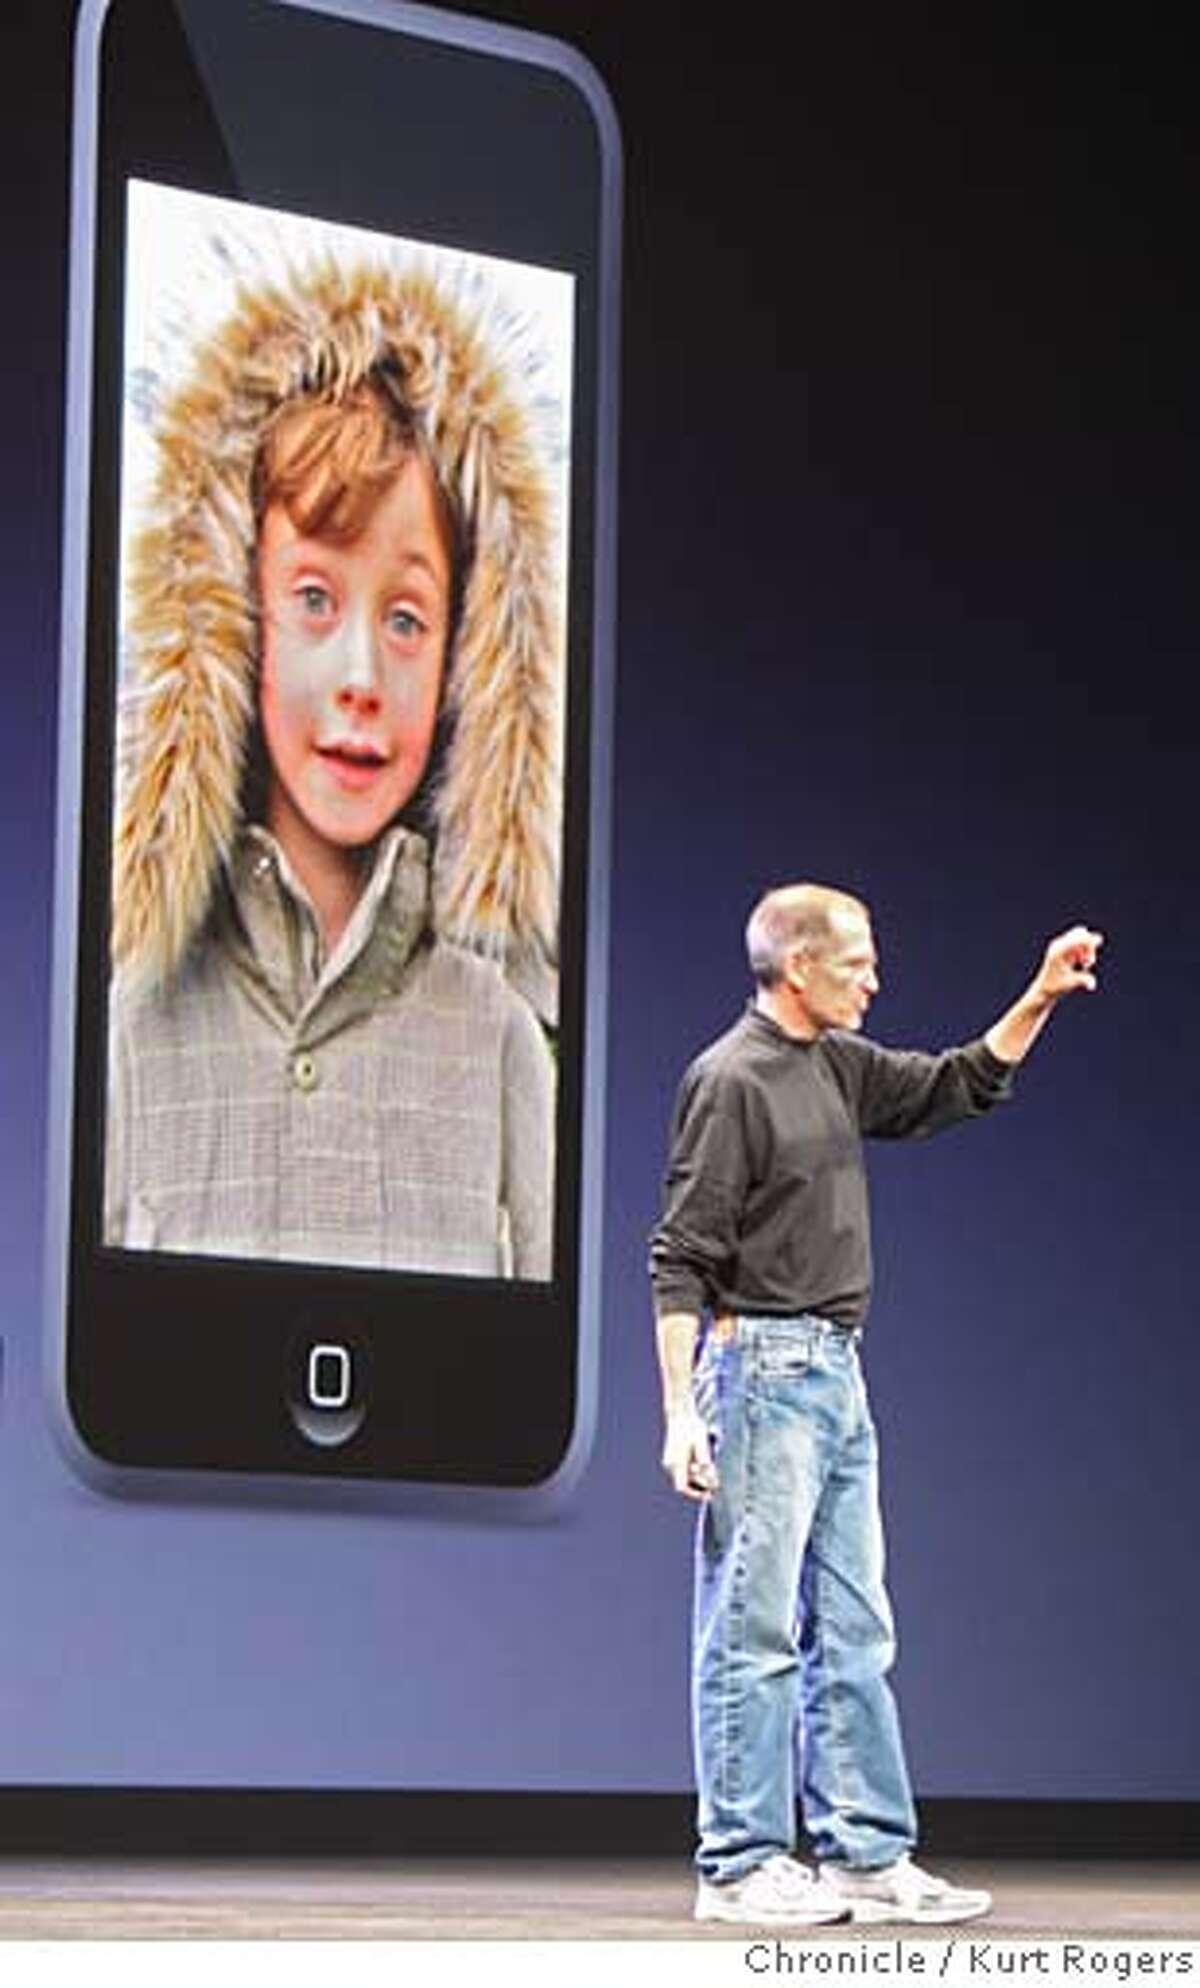 The I Pod Touch Apple's Steve Jobs announces new I pods at the Mascone center in San Francisco. WEDNESDAY, SEPT 5, 2007 KURT ROGERS SAN FRANCISCO SFC THE CHRONICLE APPLE06_299_kr.jpg